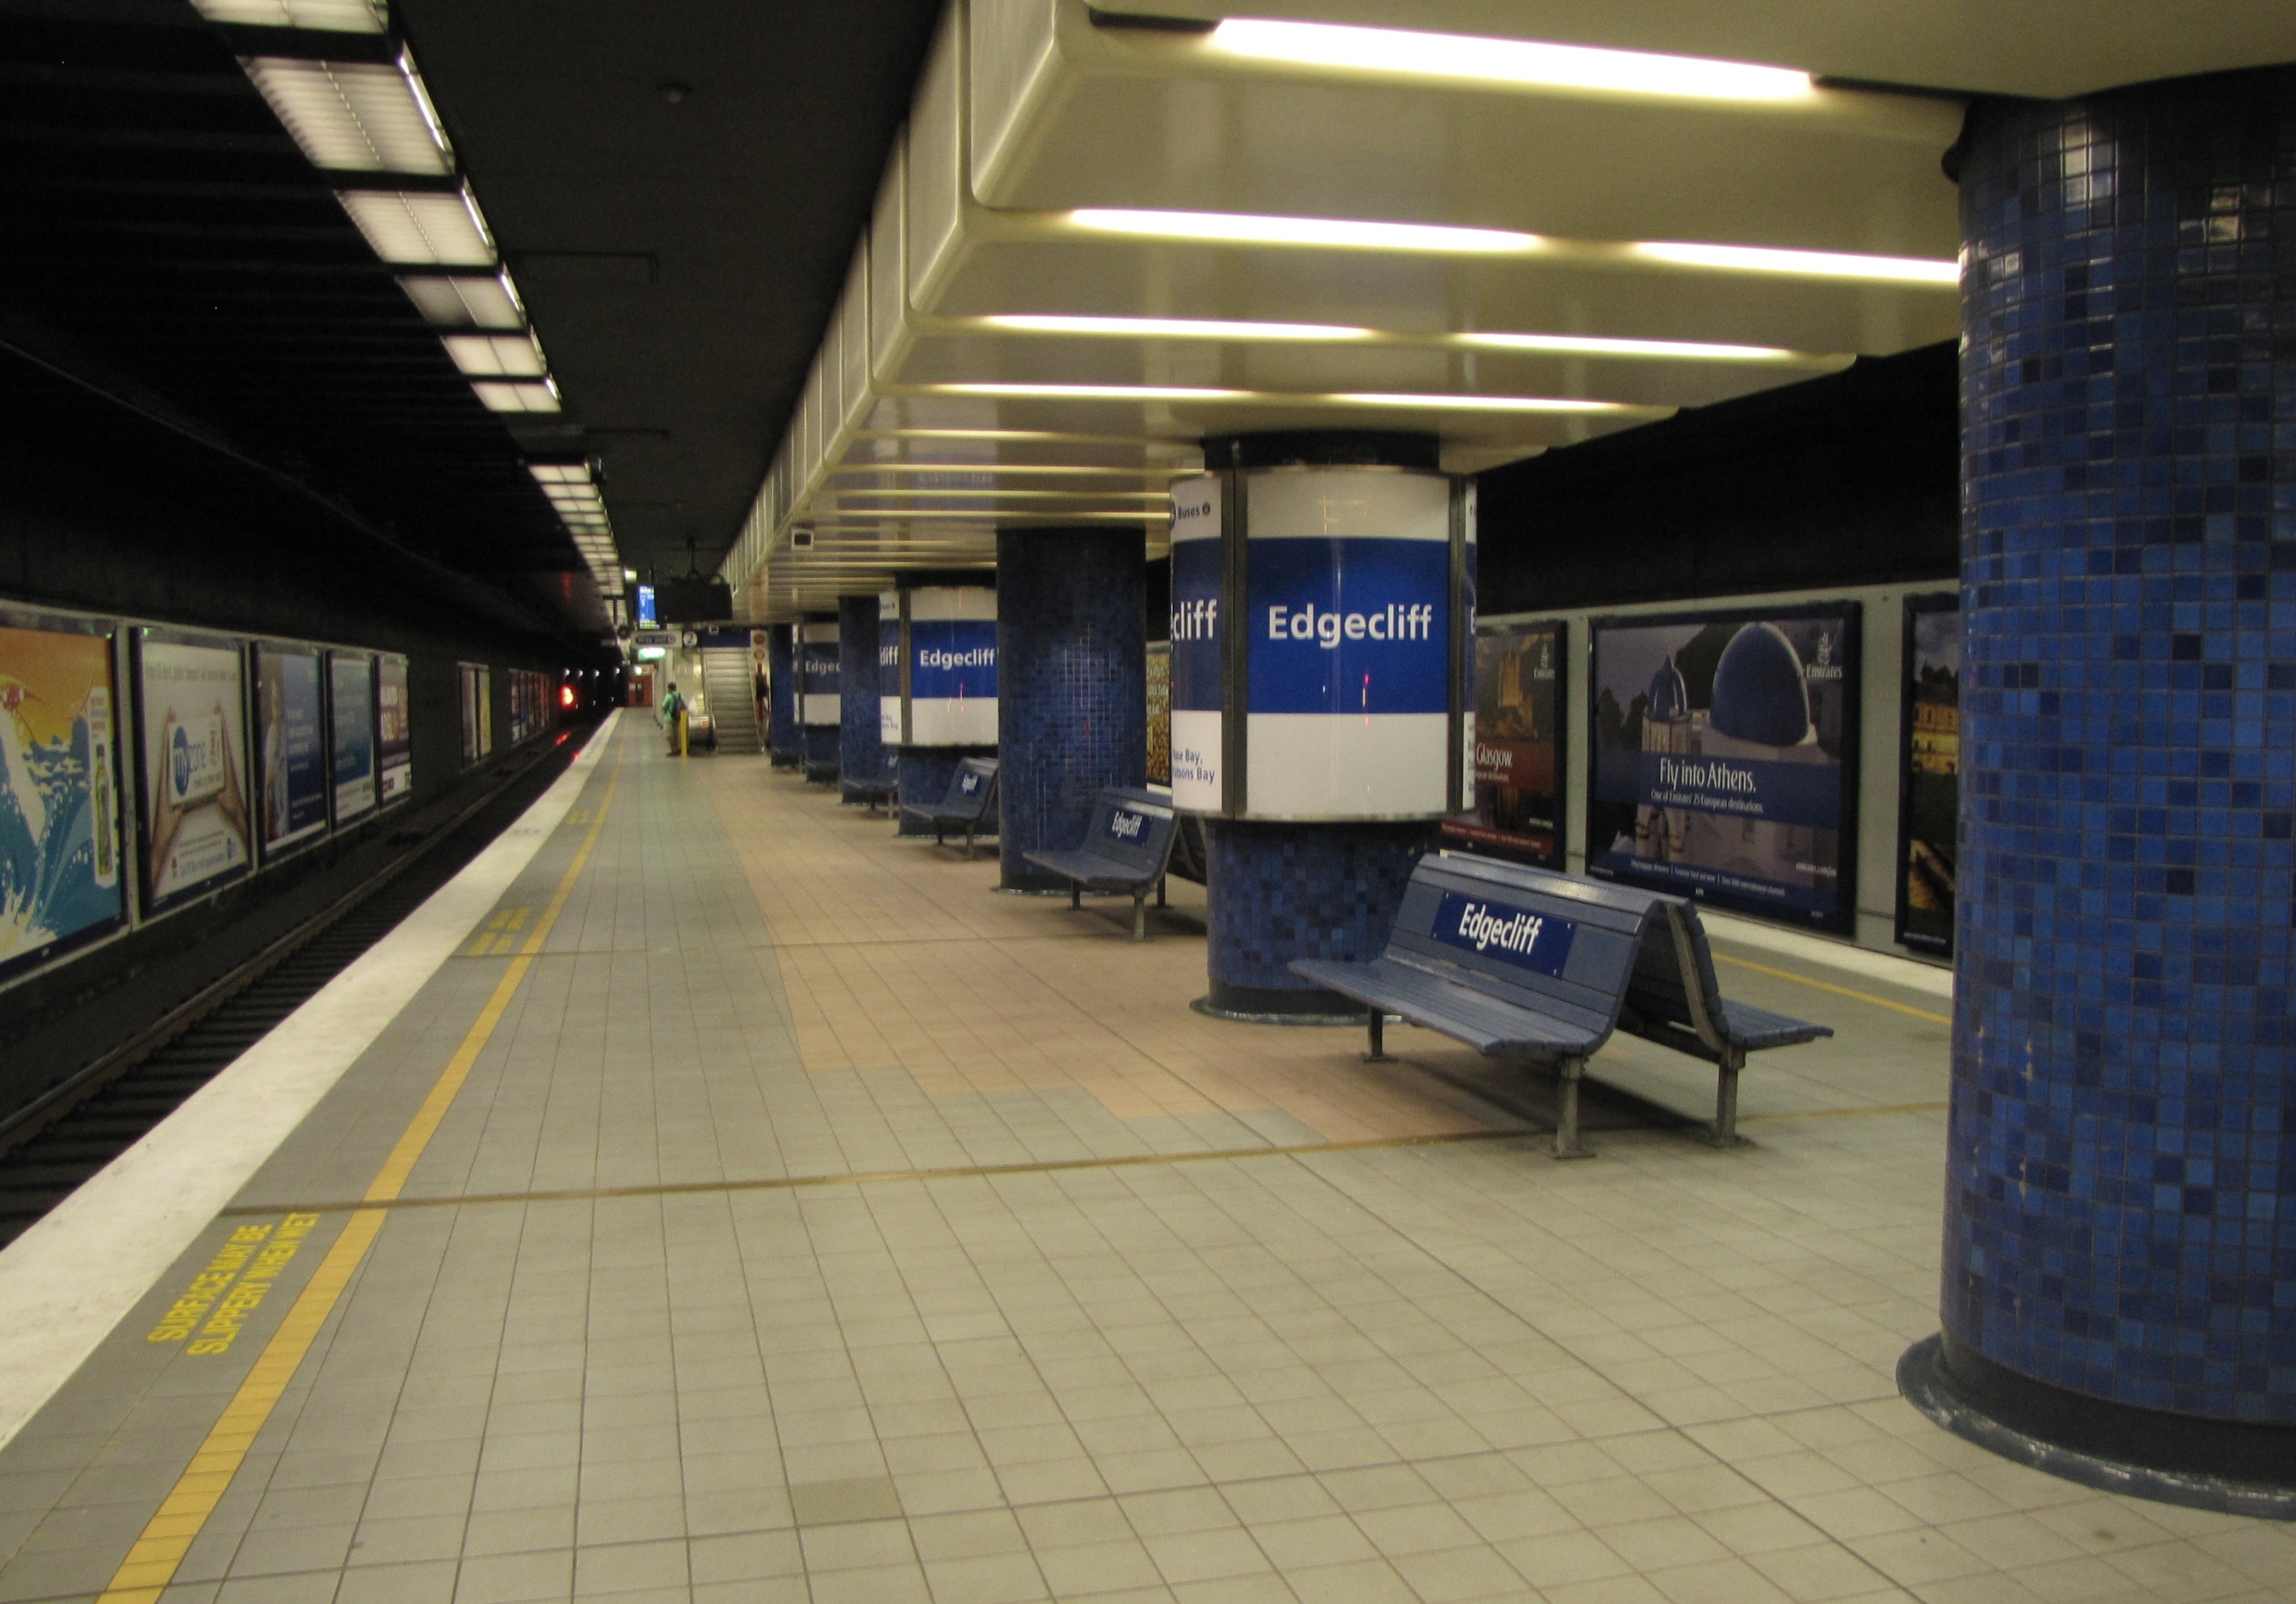 edgecliff railway station wikipedia rh en wikipedia org